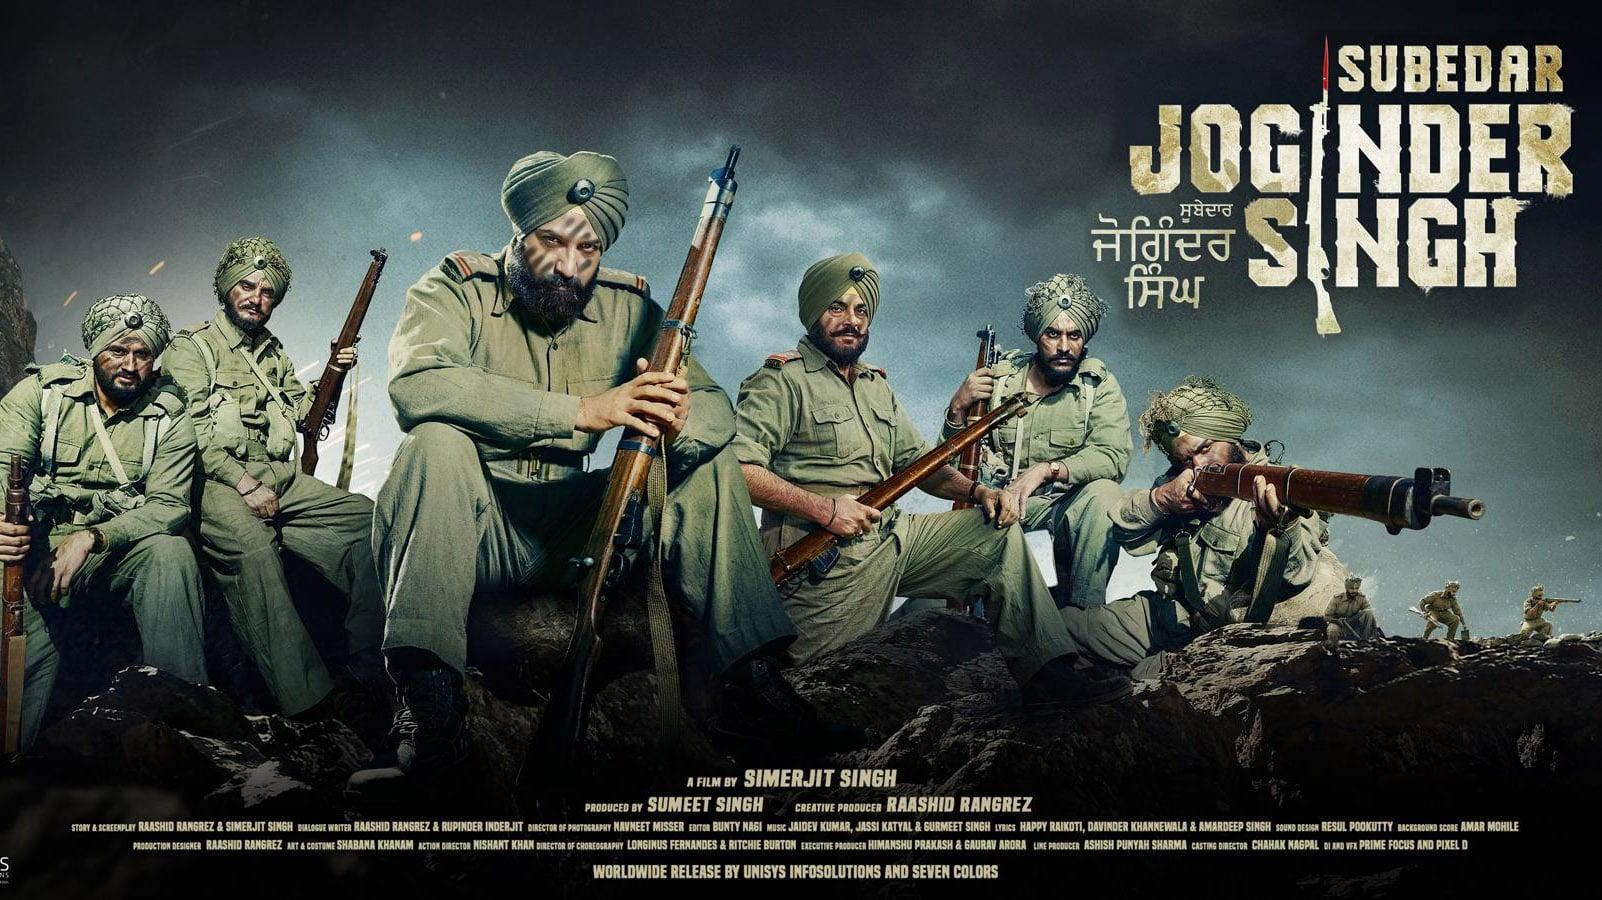 Subedar Joginder Singh  [2018]